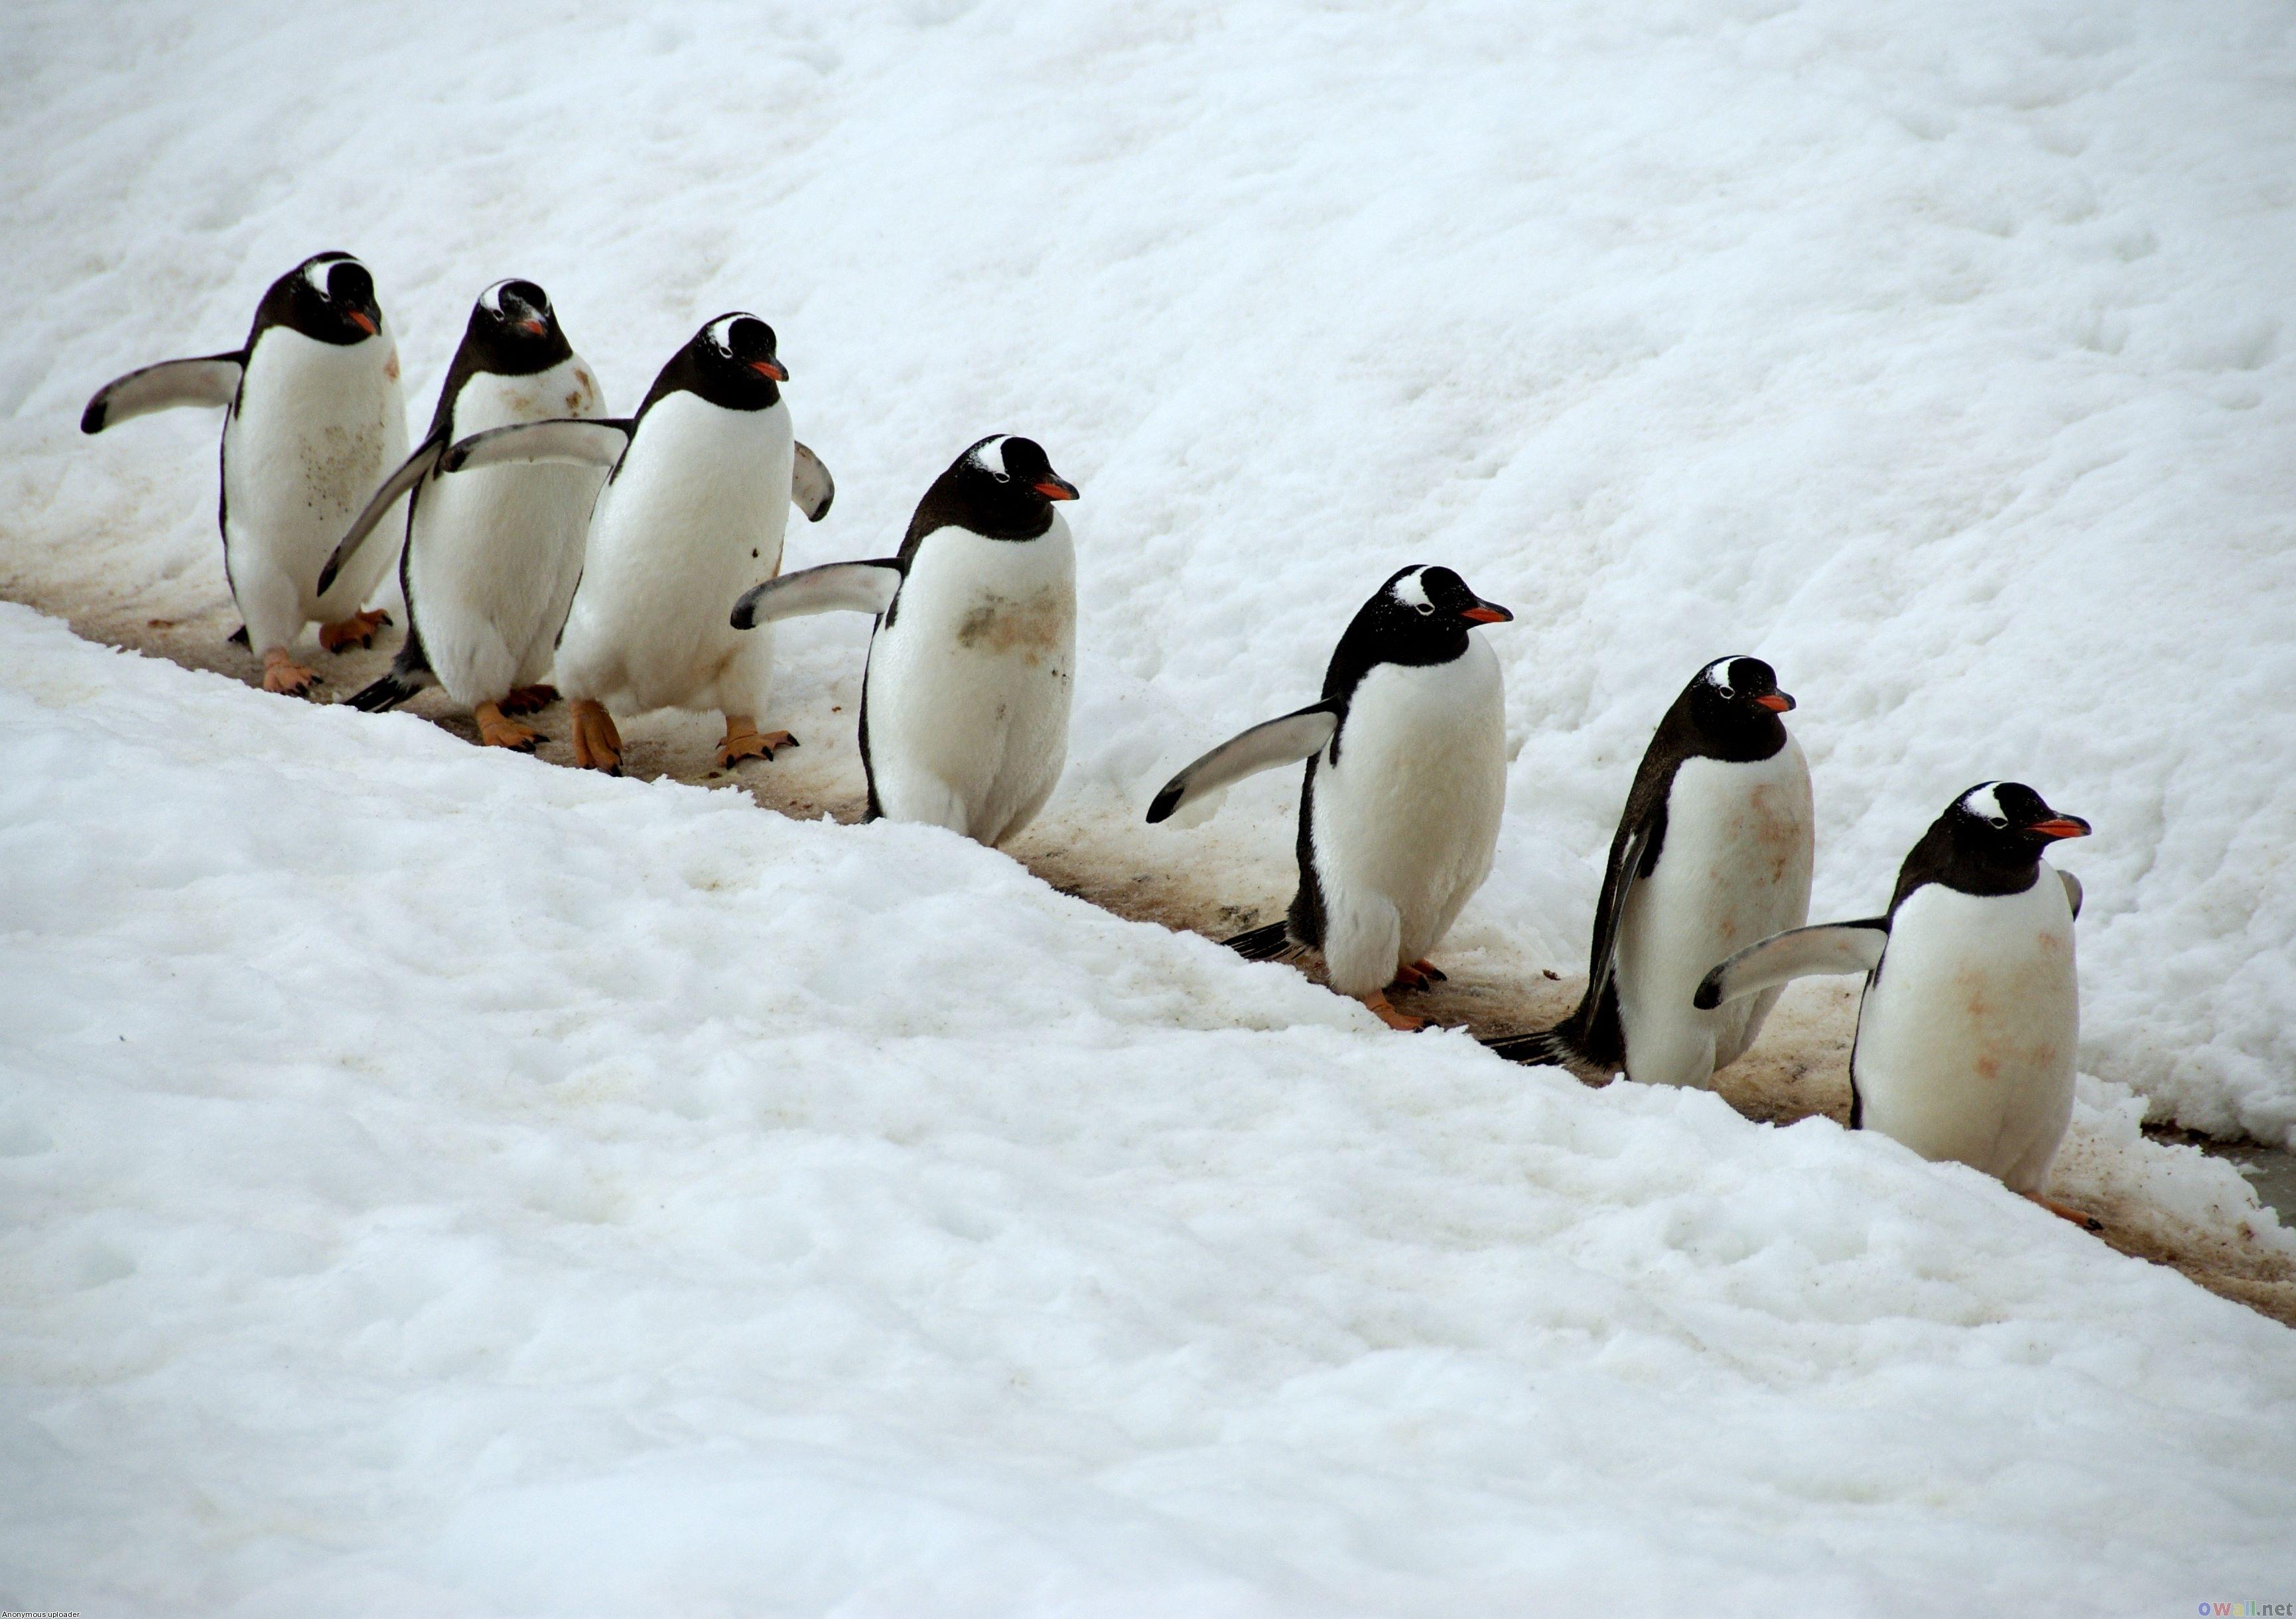 penguin images wallpapers 61 wallpapers u2013 hd wallpapers